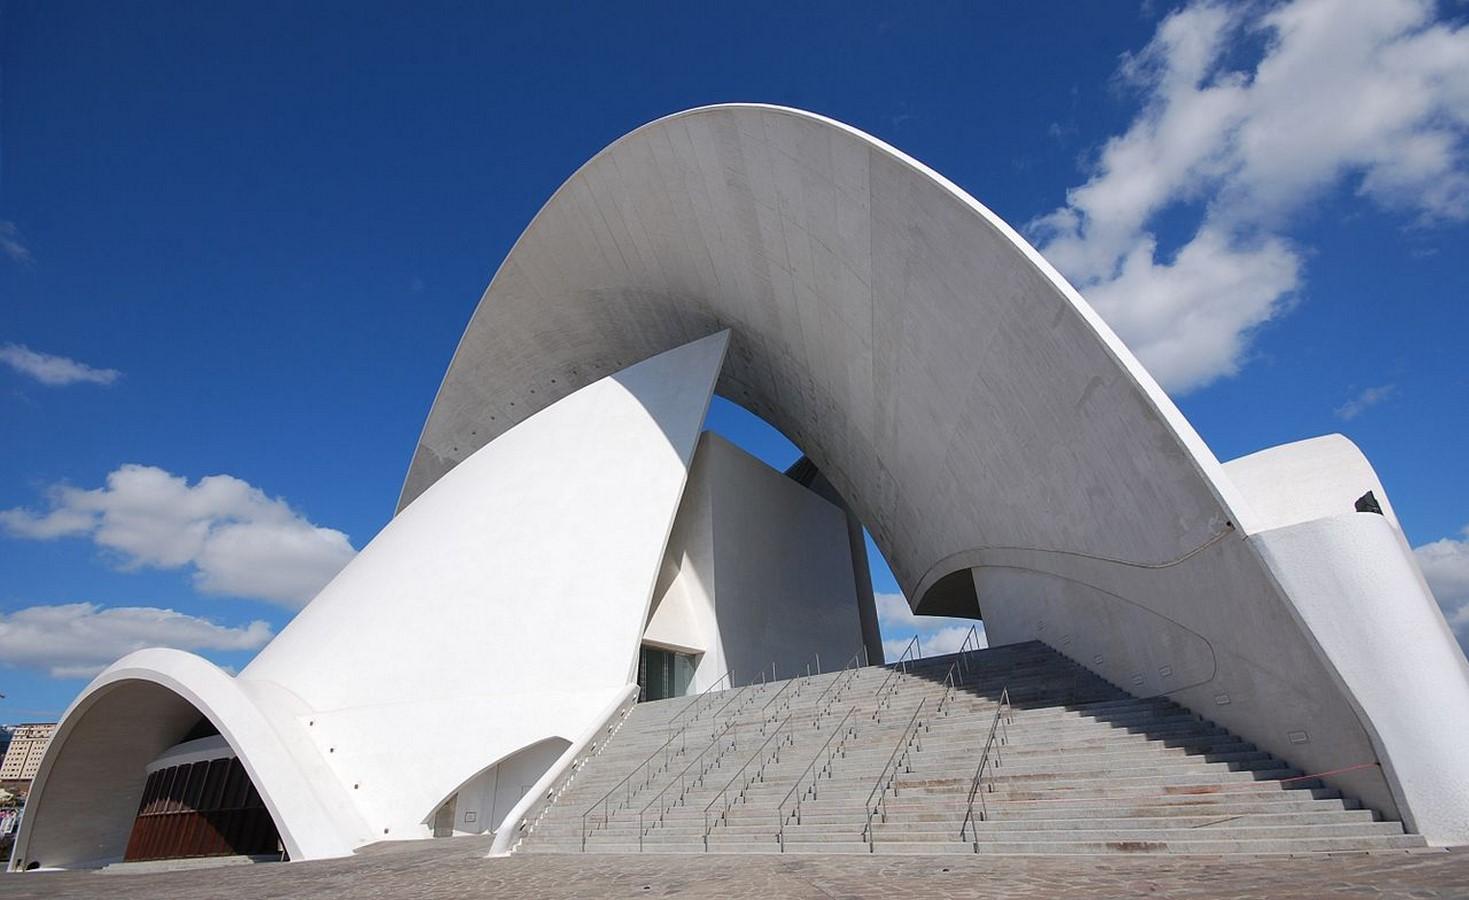 Auditorio de Tenerife Adán Martín by Santiago Calatrava: The great Arc - Sheet7